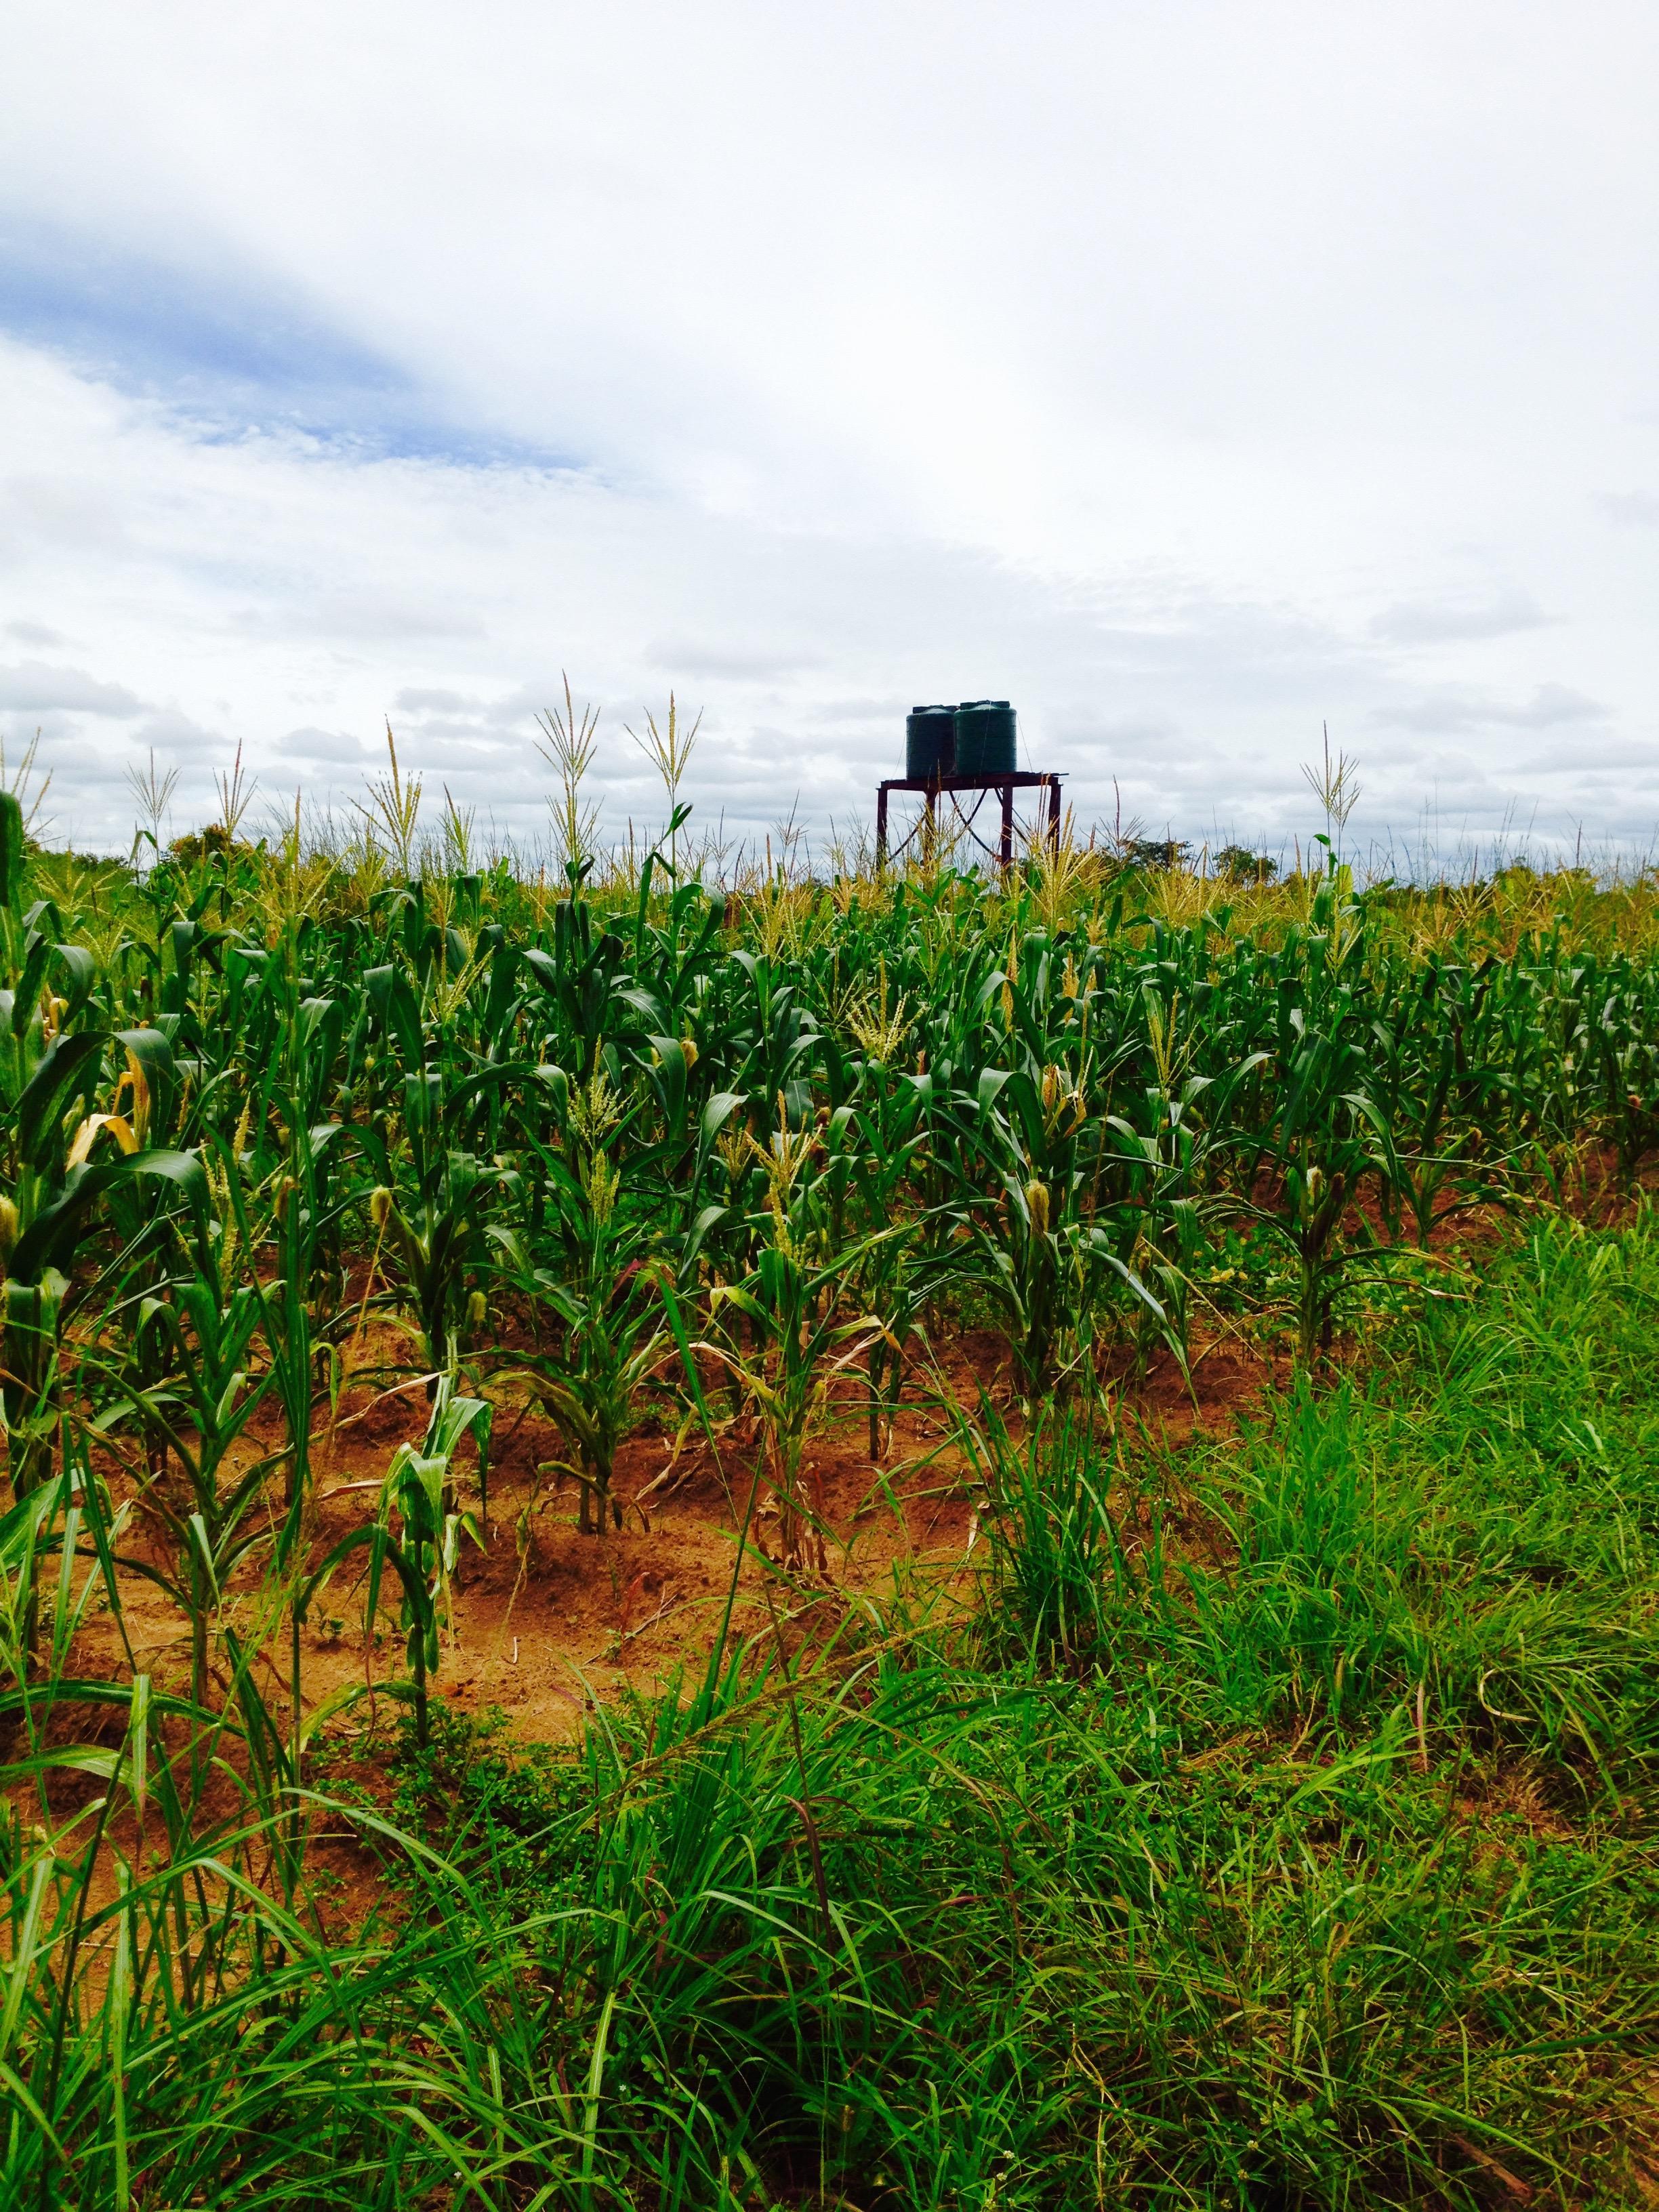 Zambia 2010 031 (1).jpg